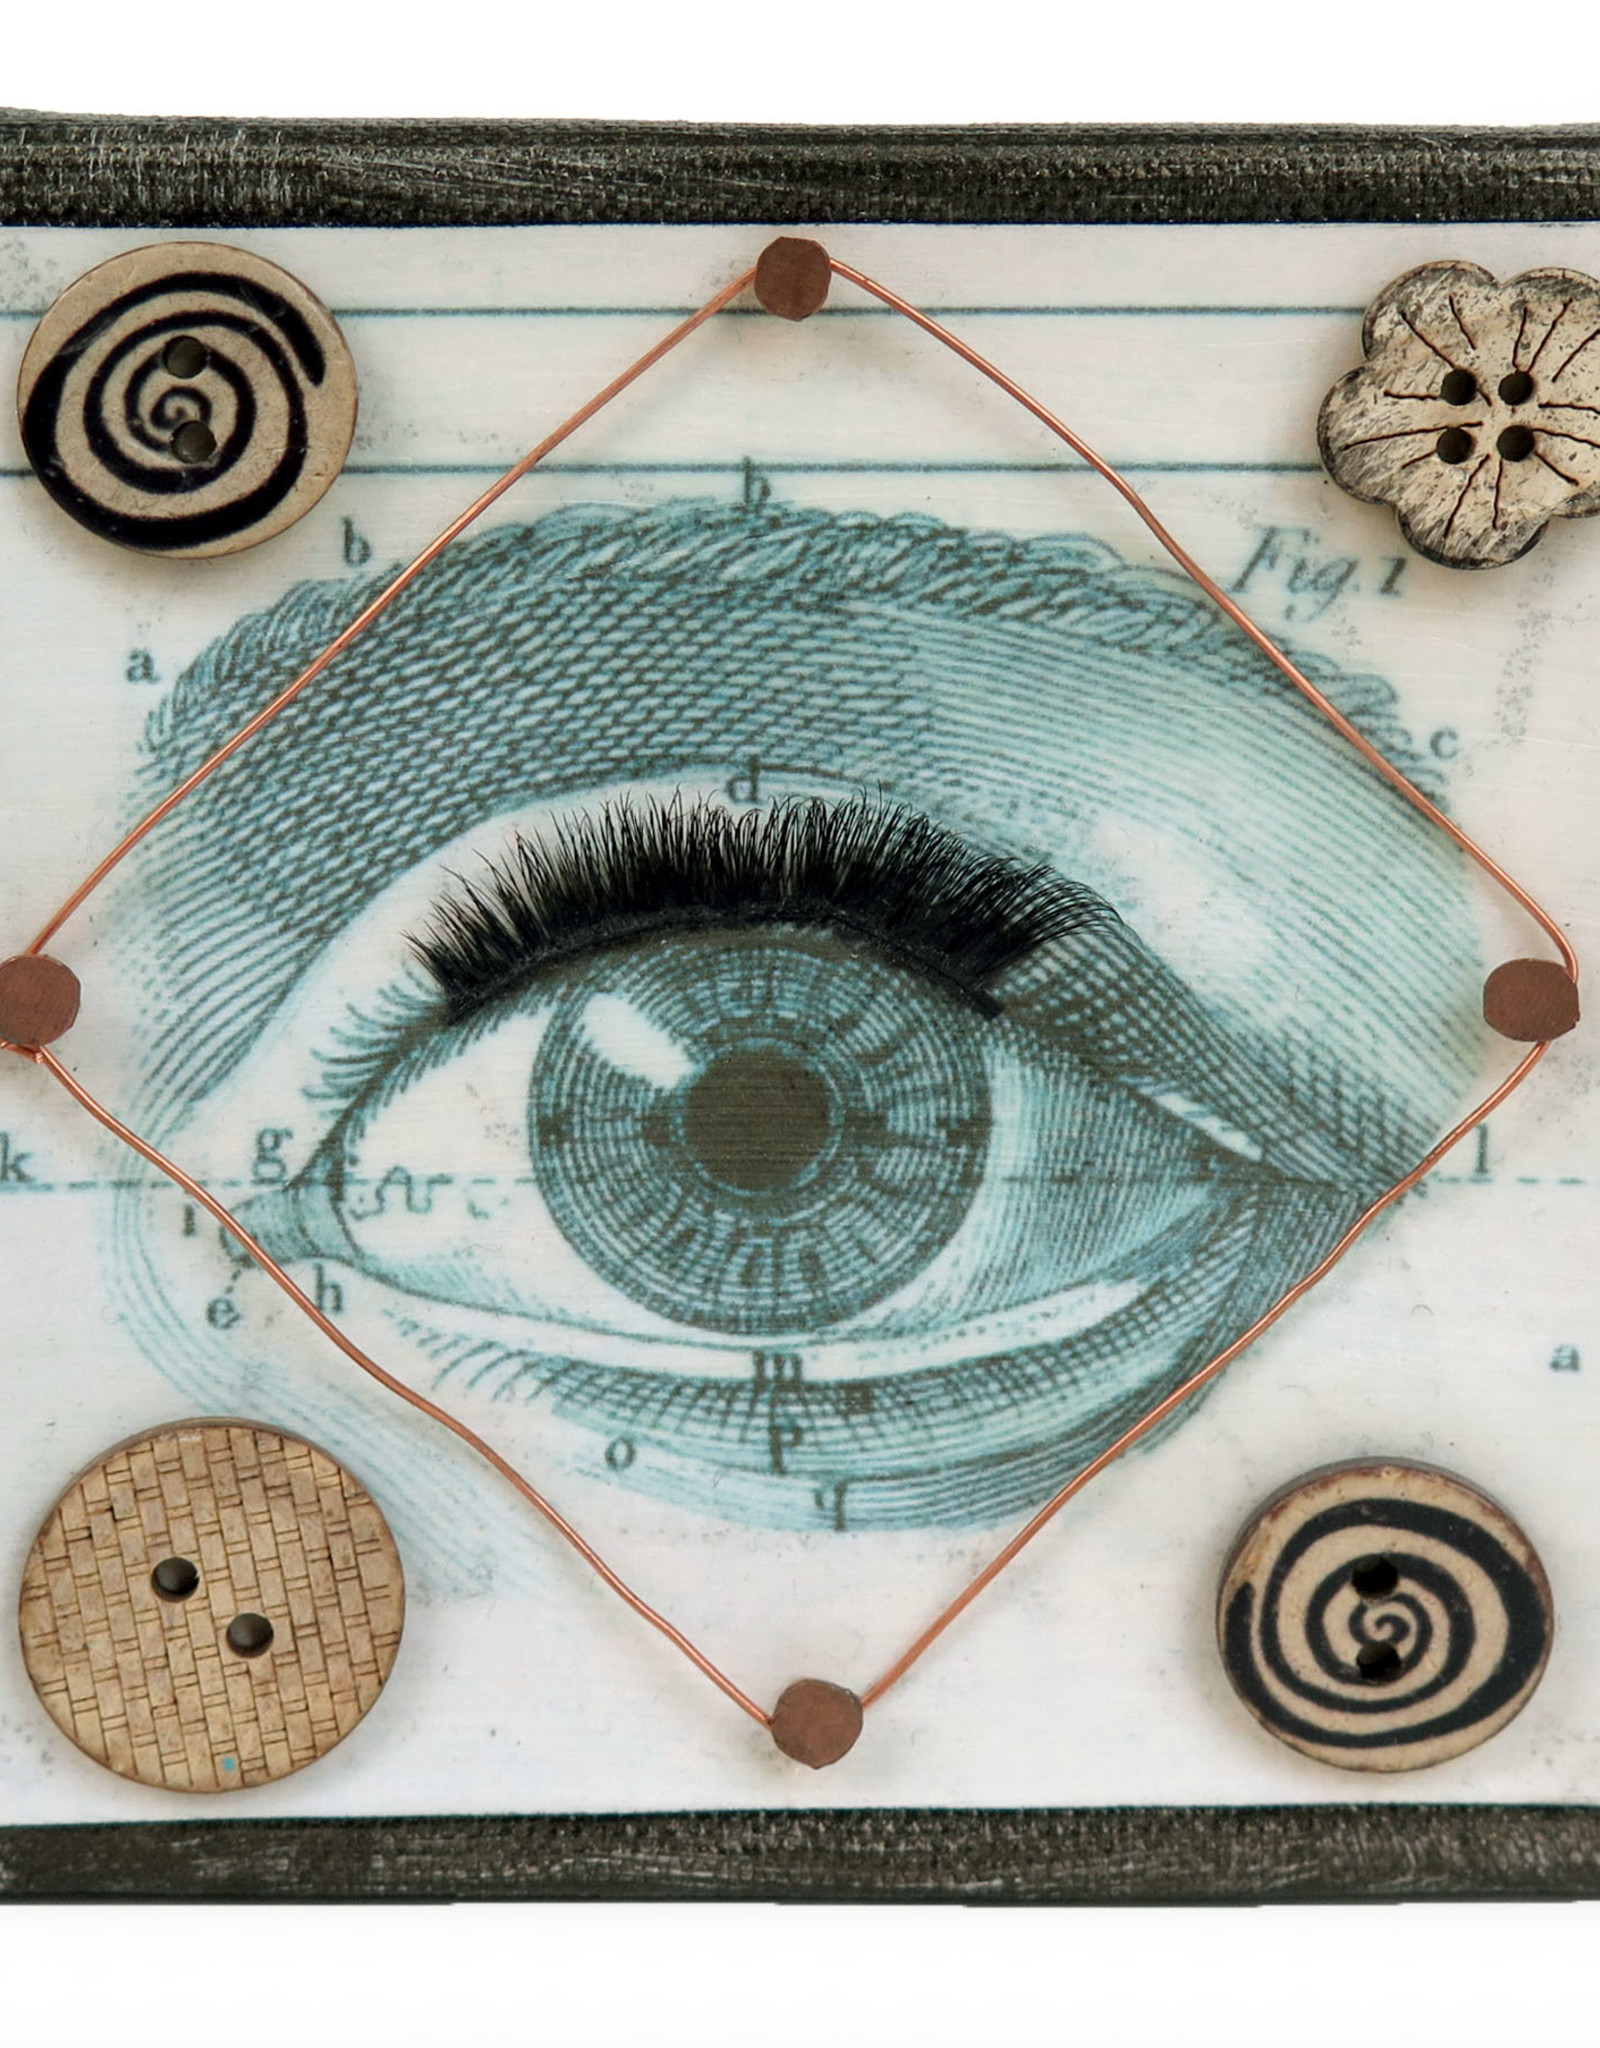 Oculus by Jason Hall